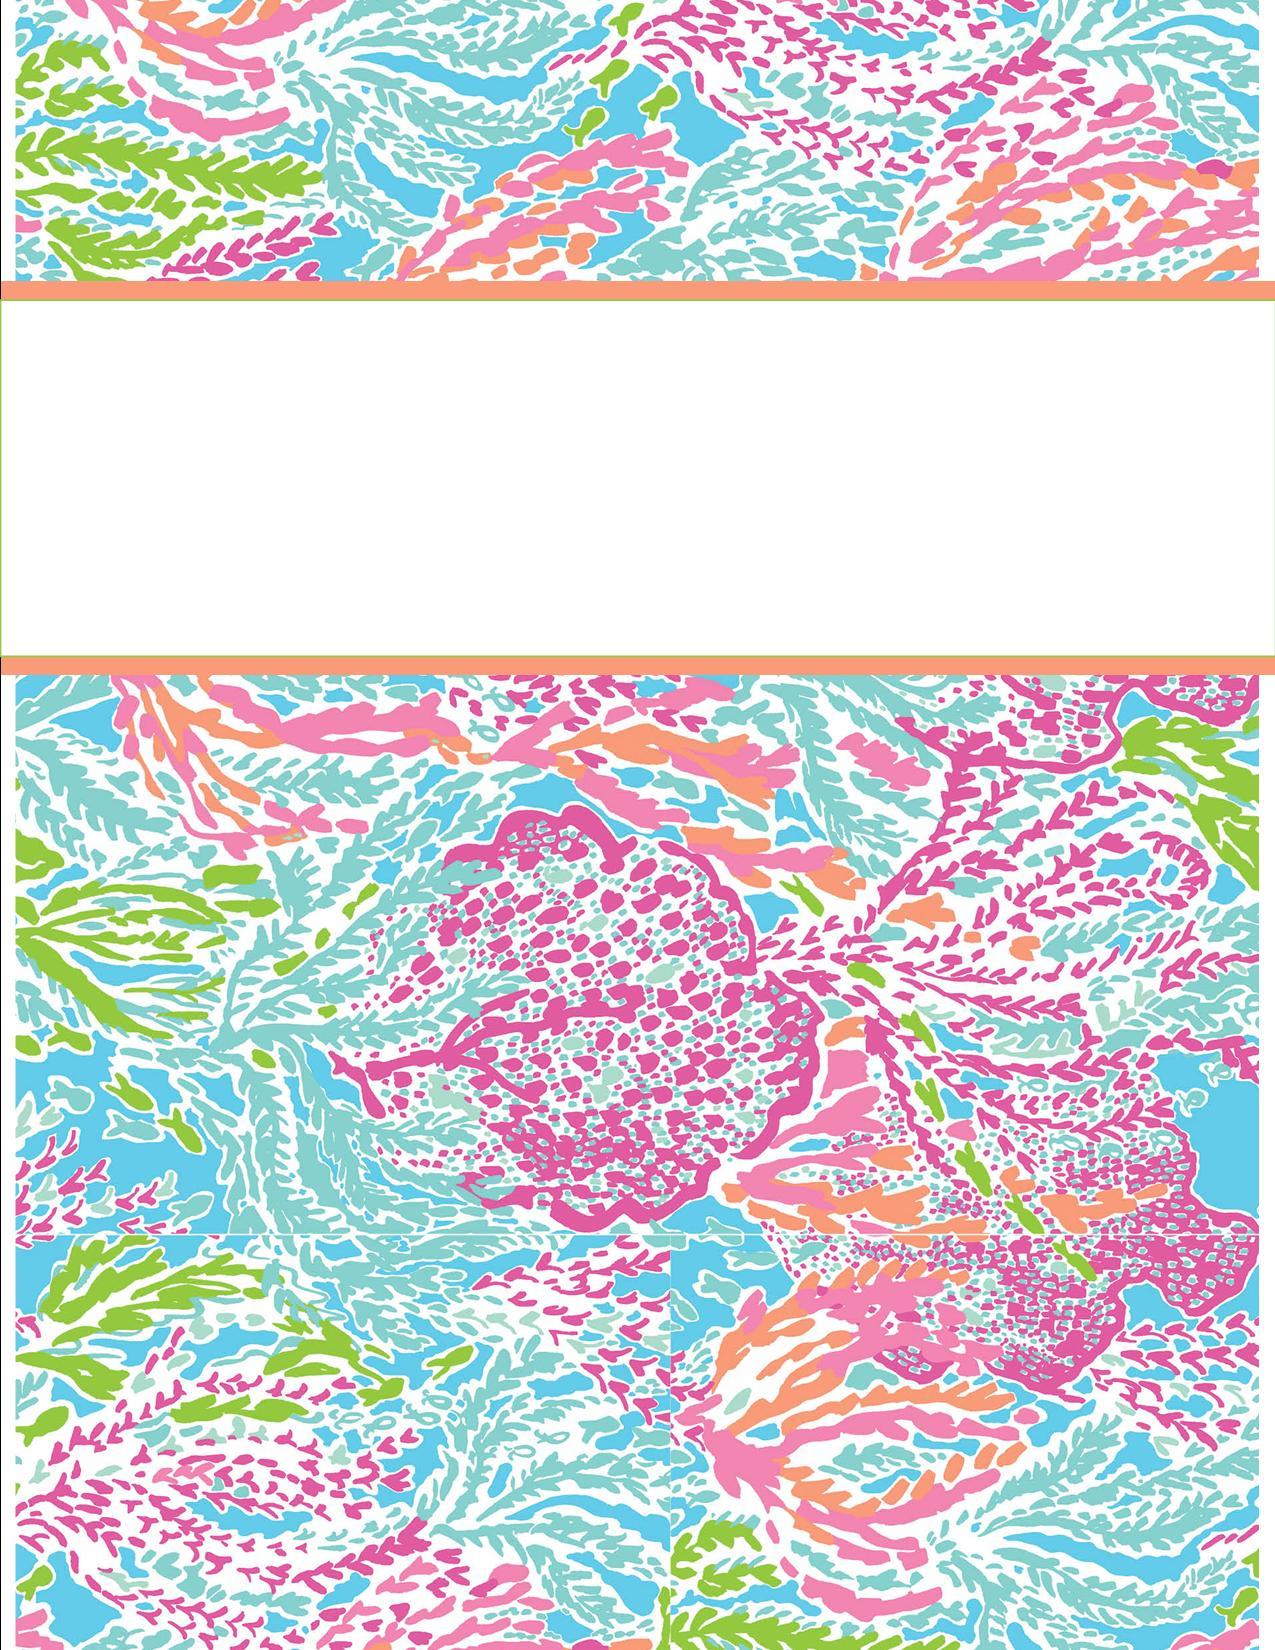 girly binder covers